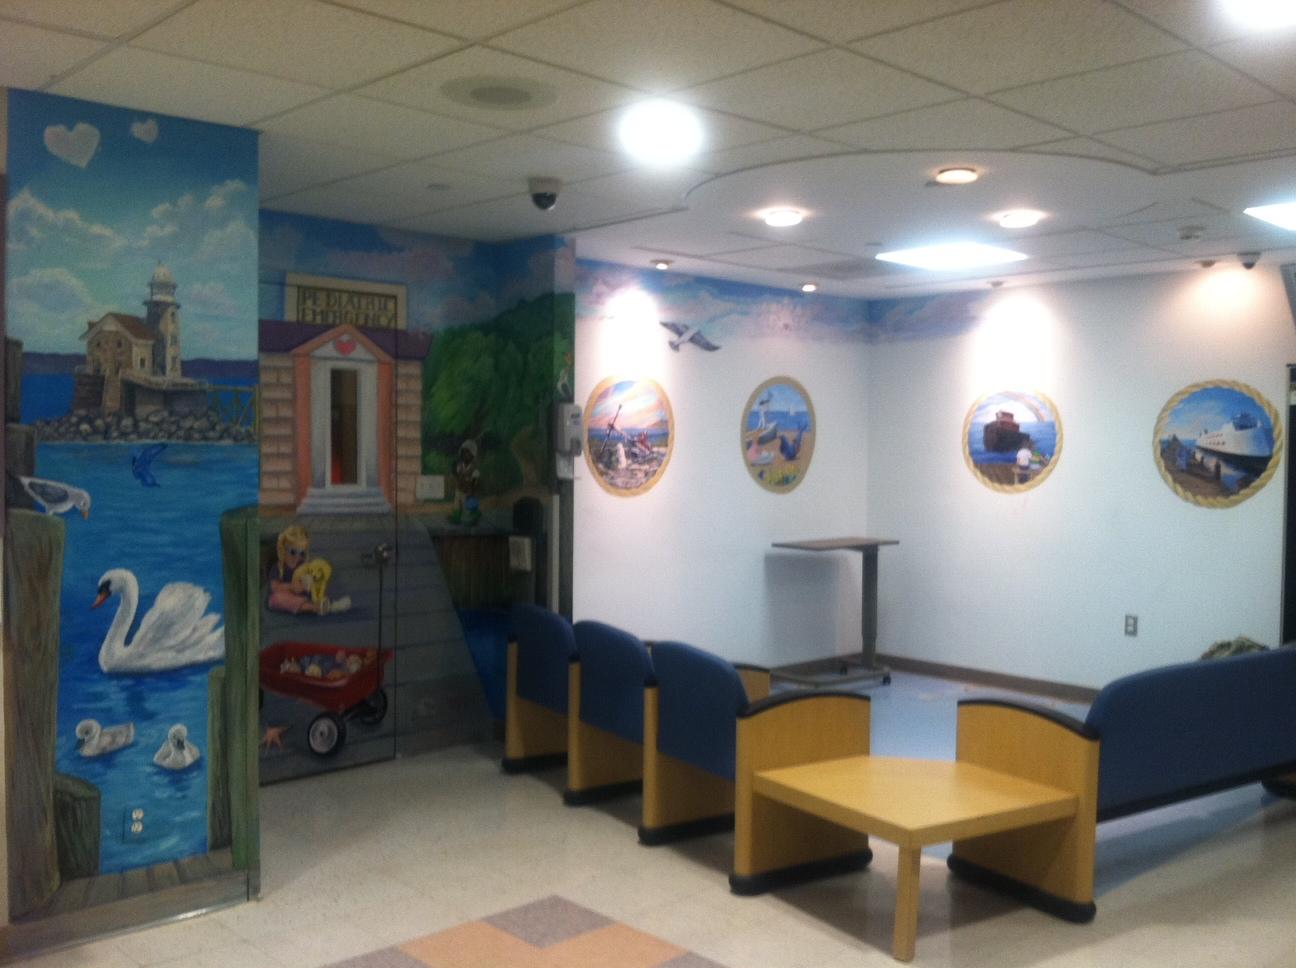 Jefferson Hospital Emergency Room